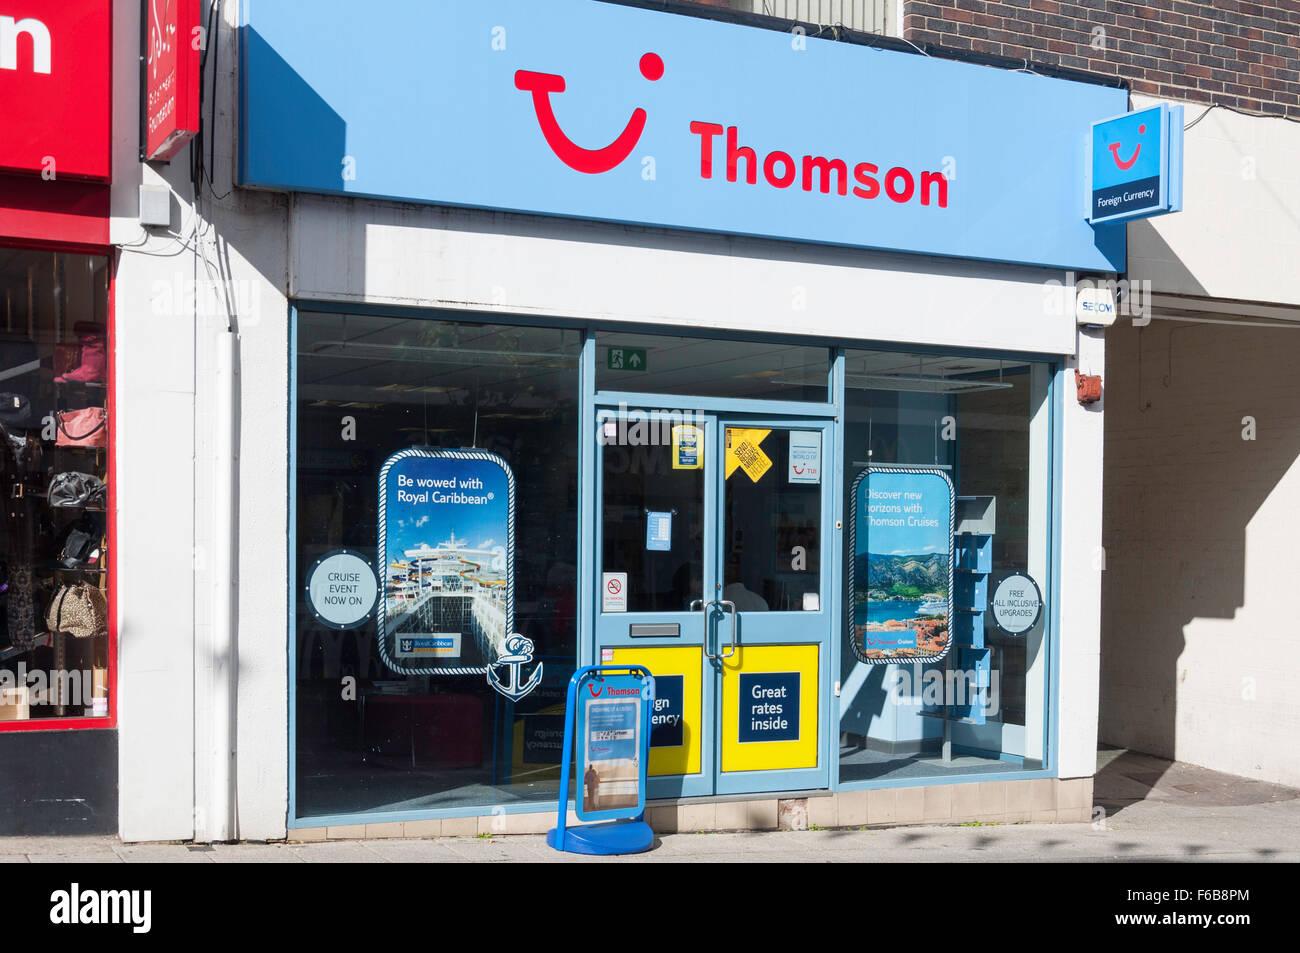 Thomson Holidays travel Agents, Union Street, Aldershot, Hampshire, England, Vereinigtes Königreich Stockbild